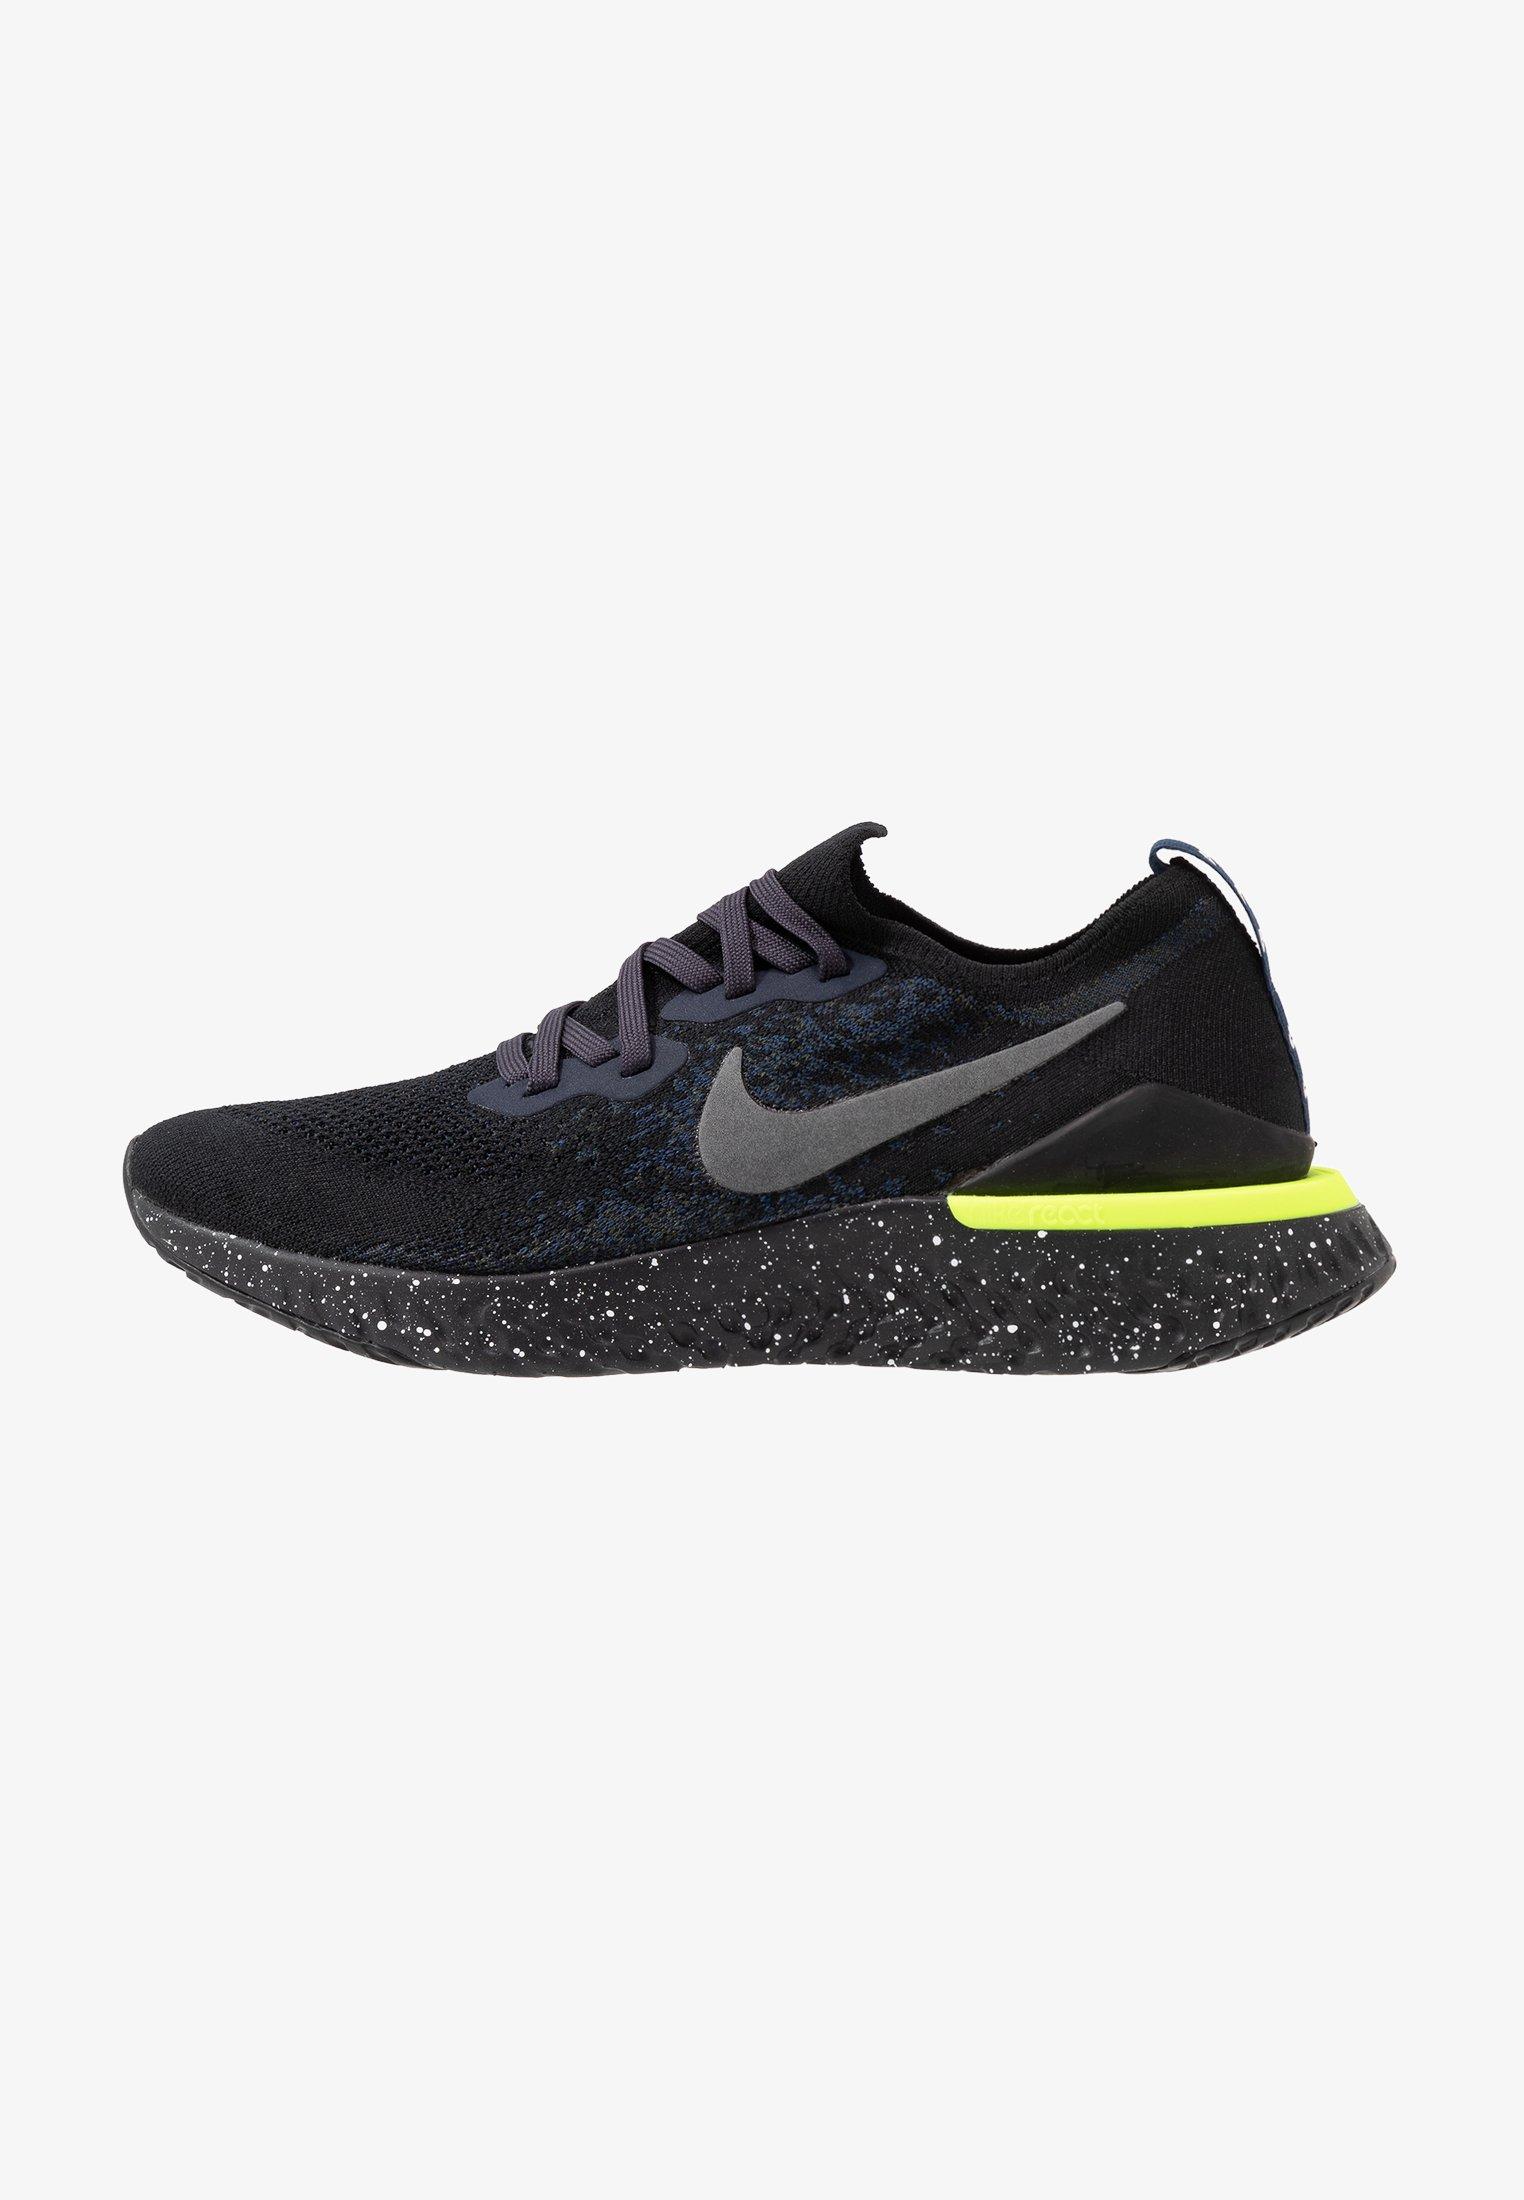 referir sugerir reacción  Nike Performance EPIC REACT FLYKNIT 2 SE - Zapatillas de running neutras -  black/sequoia/summit white/negro - Zalando.es